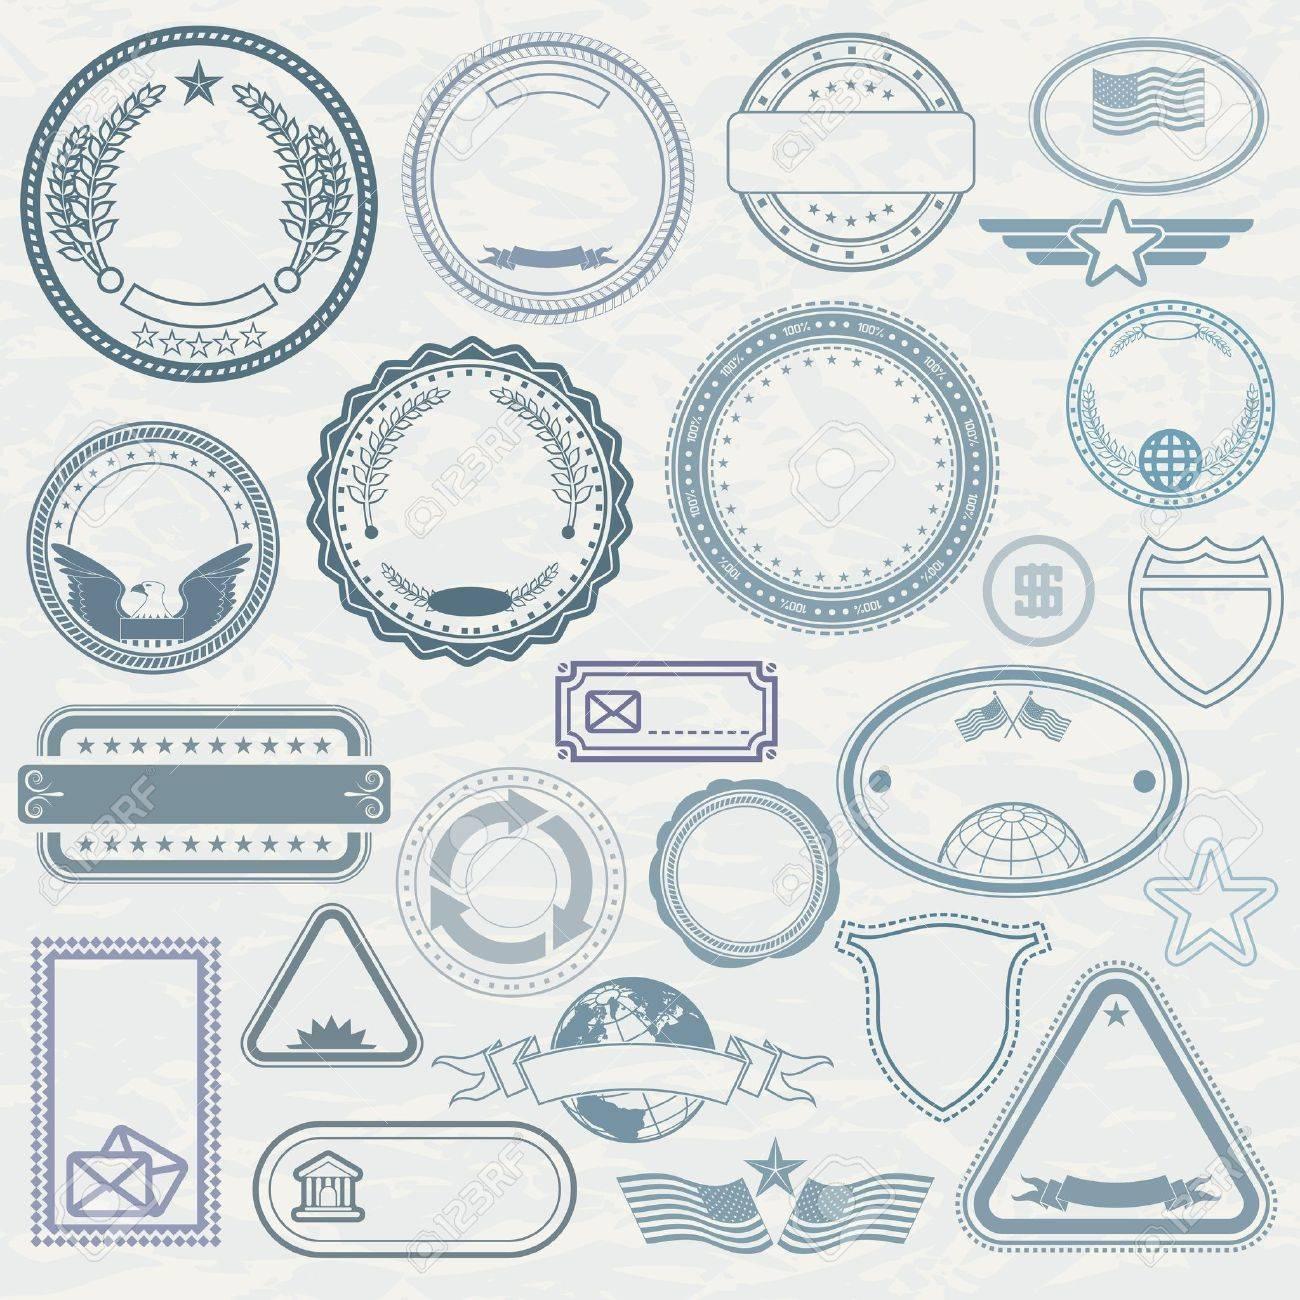 Stempel Vorlagen Von Stempel Selbst Gestalten Muster Stempel